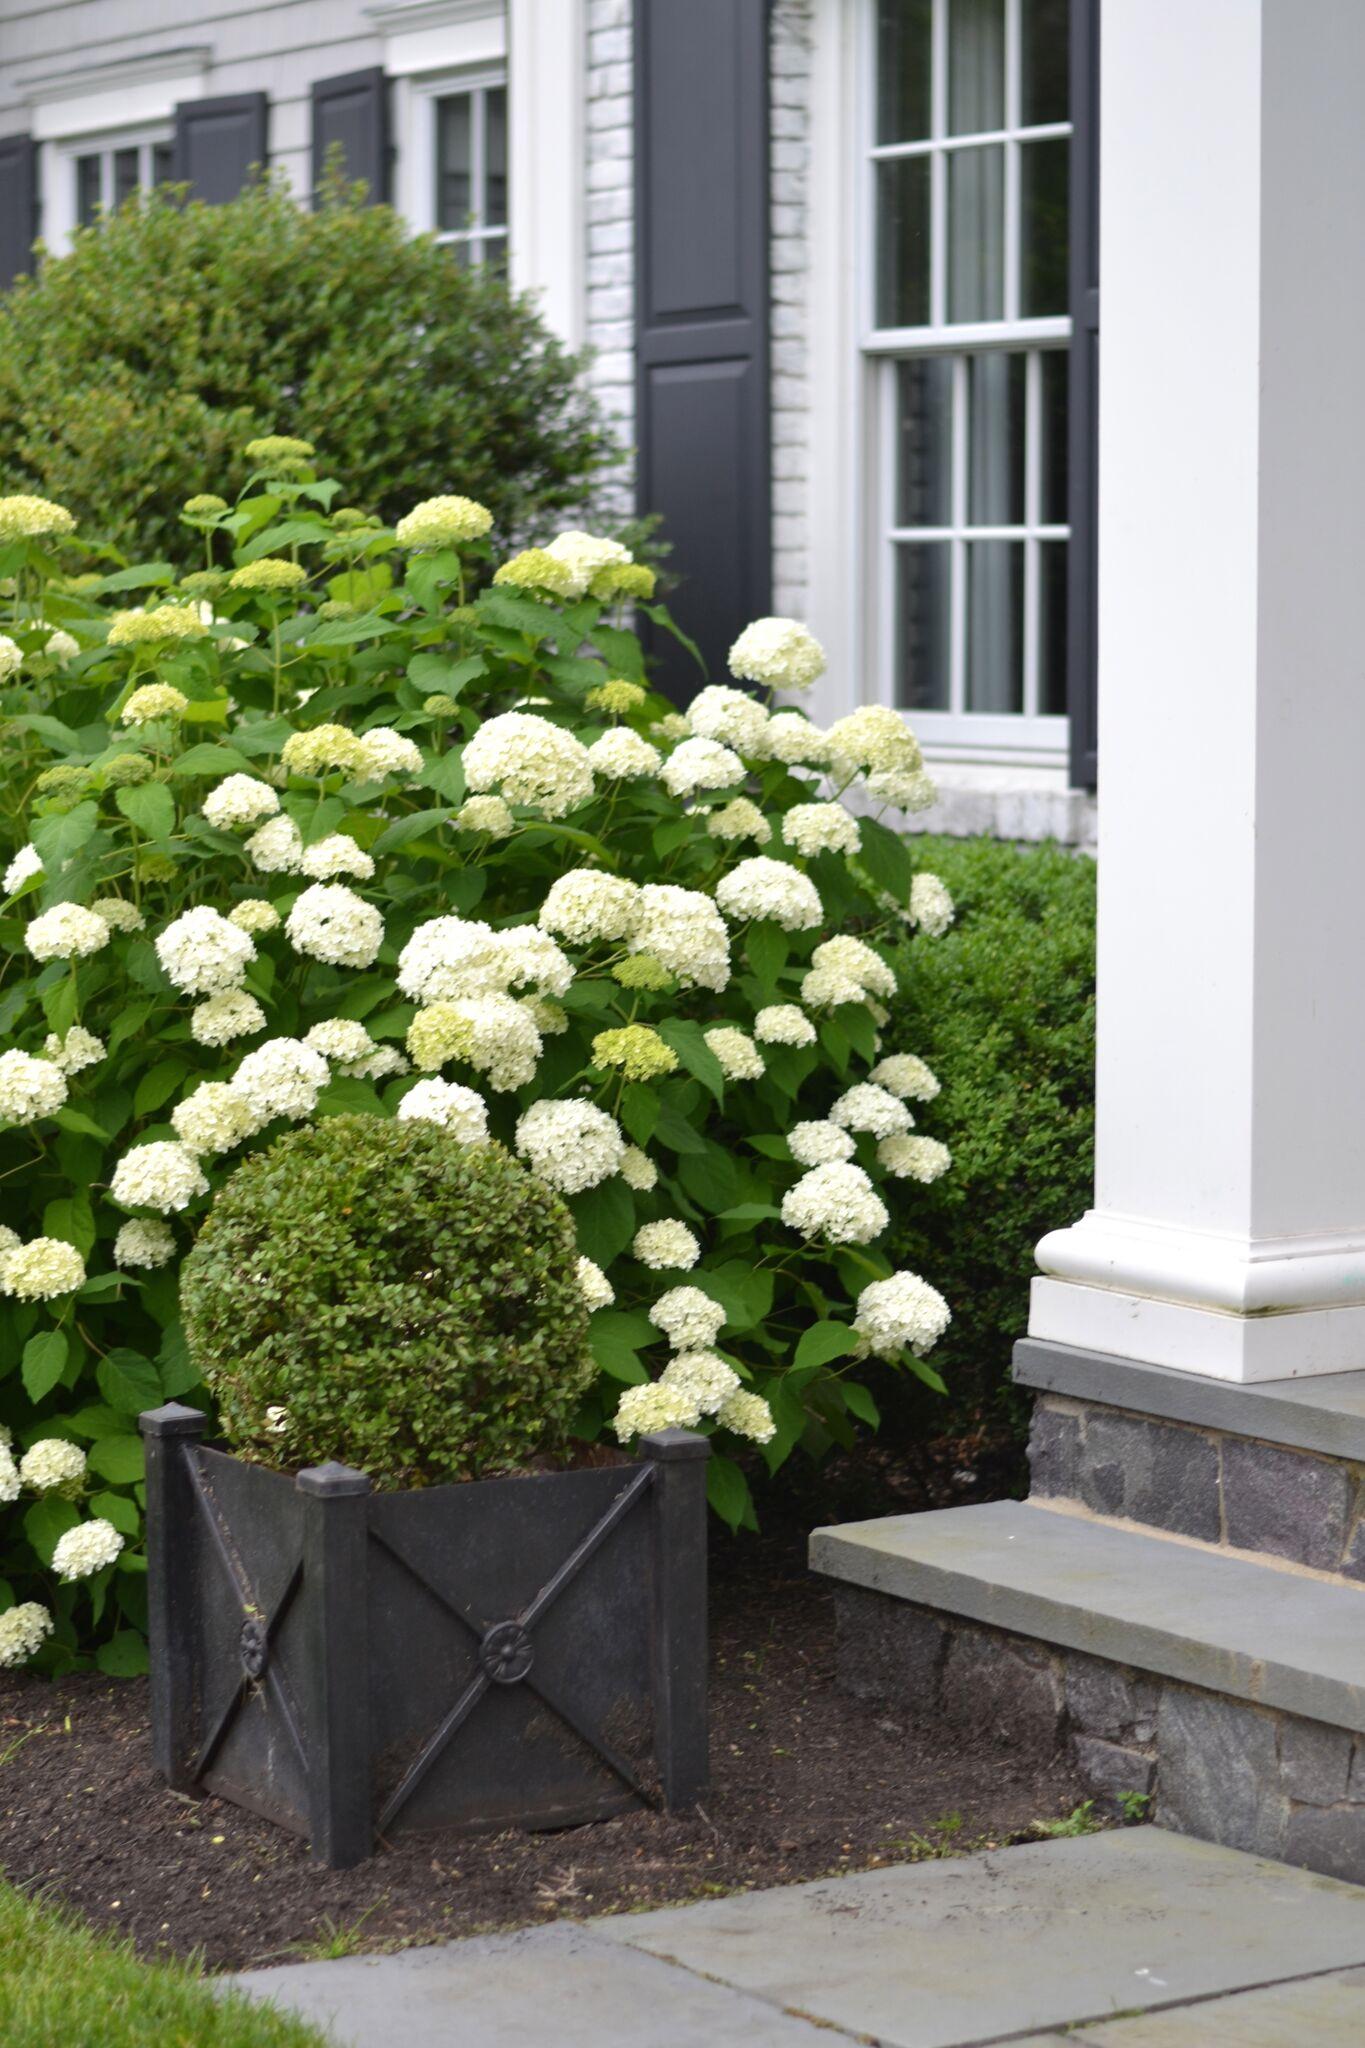 les-fleurs-home-gardening-benefits-floral.jpg